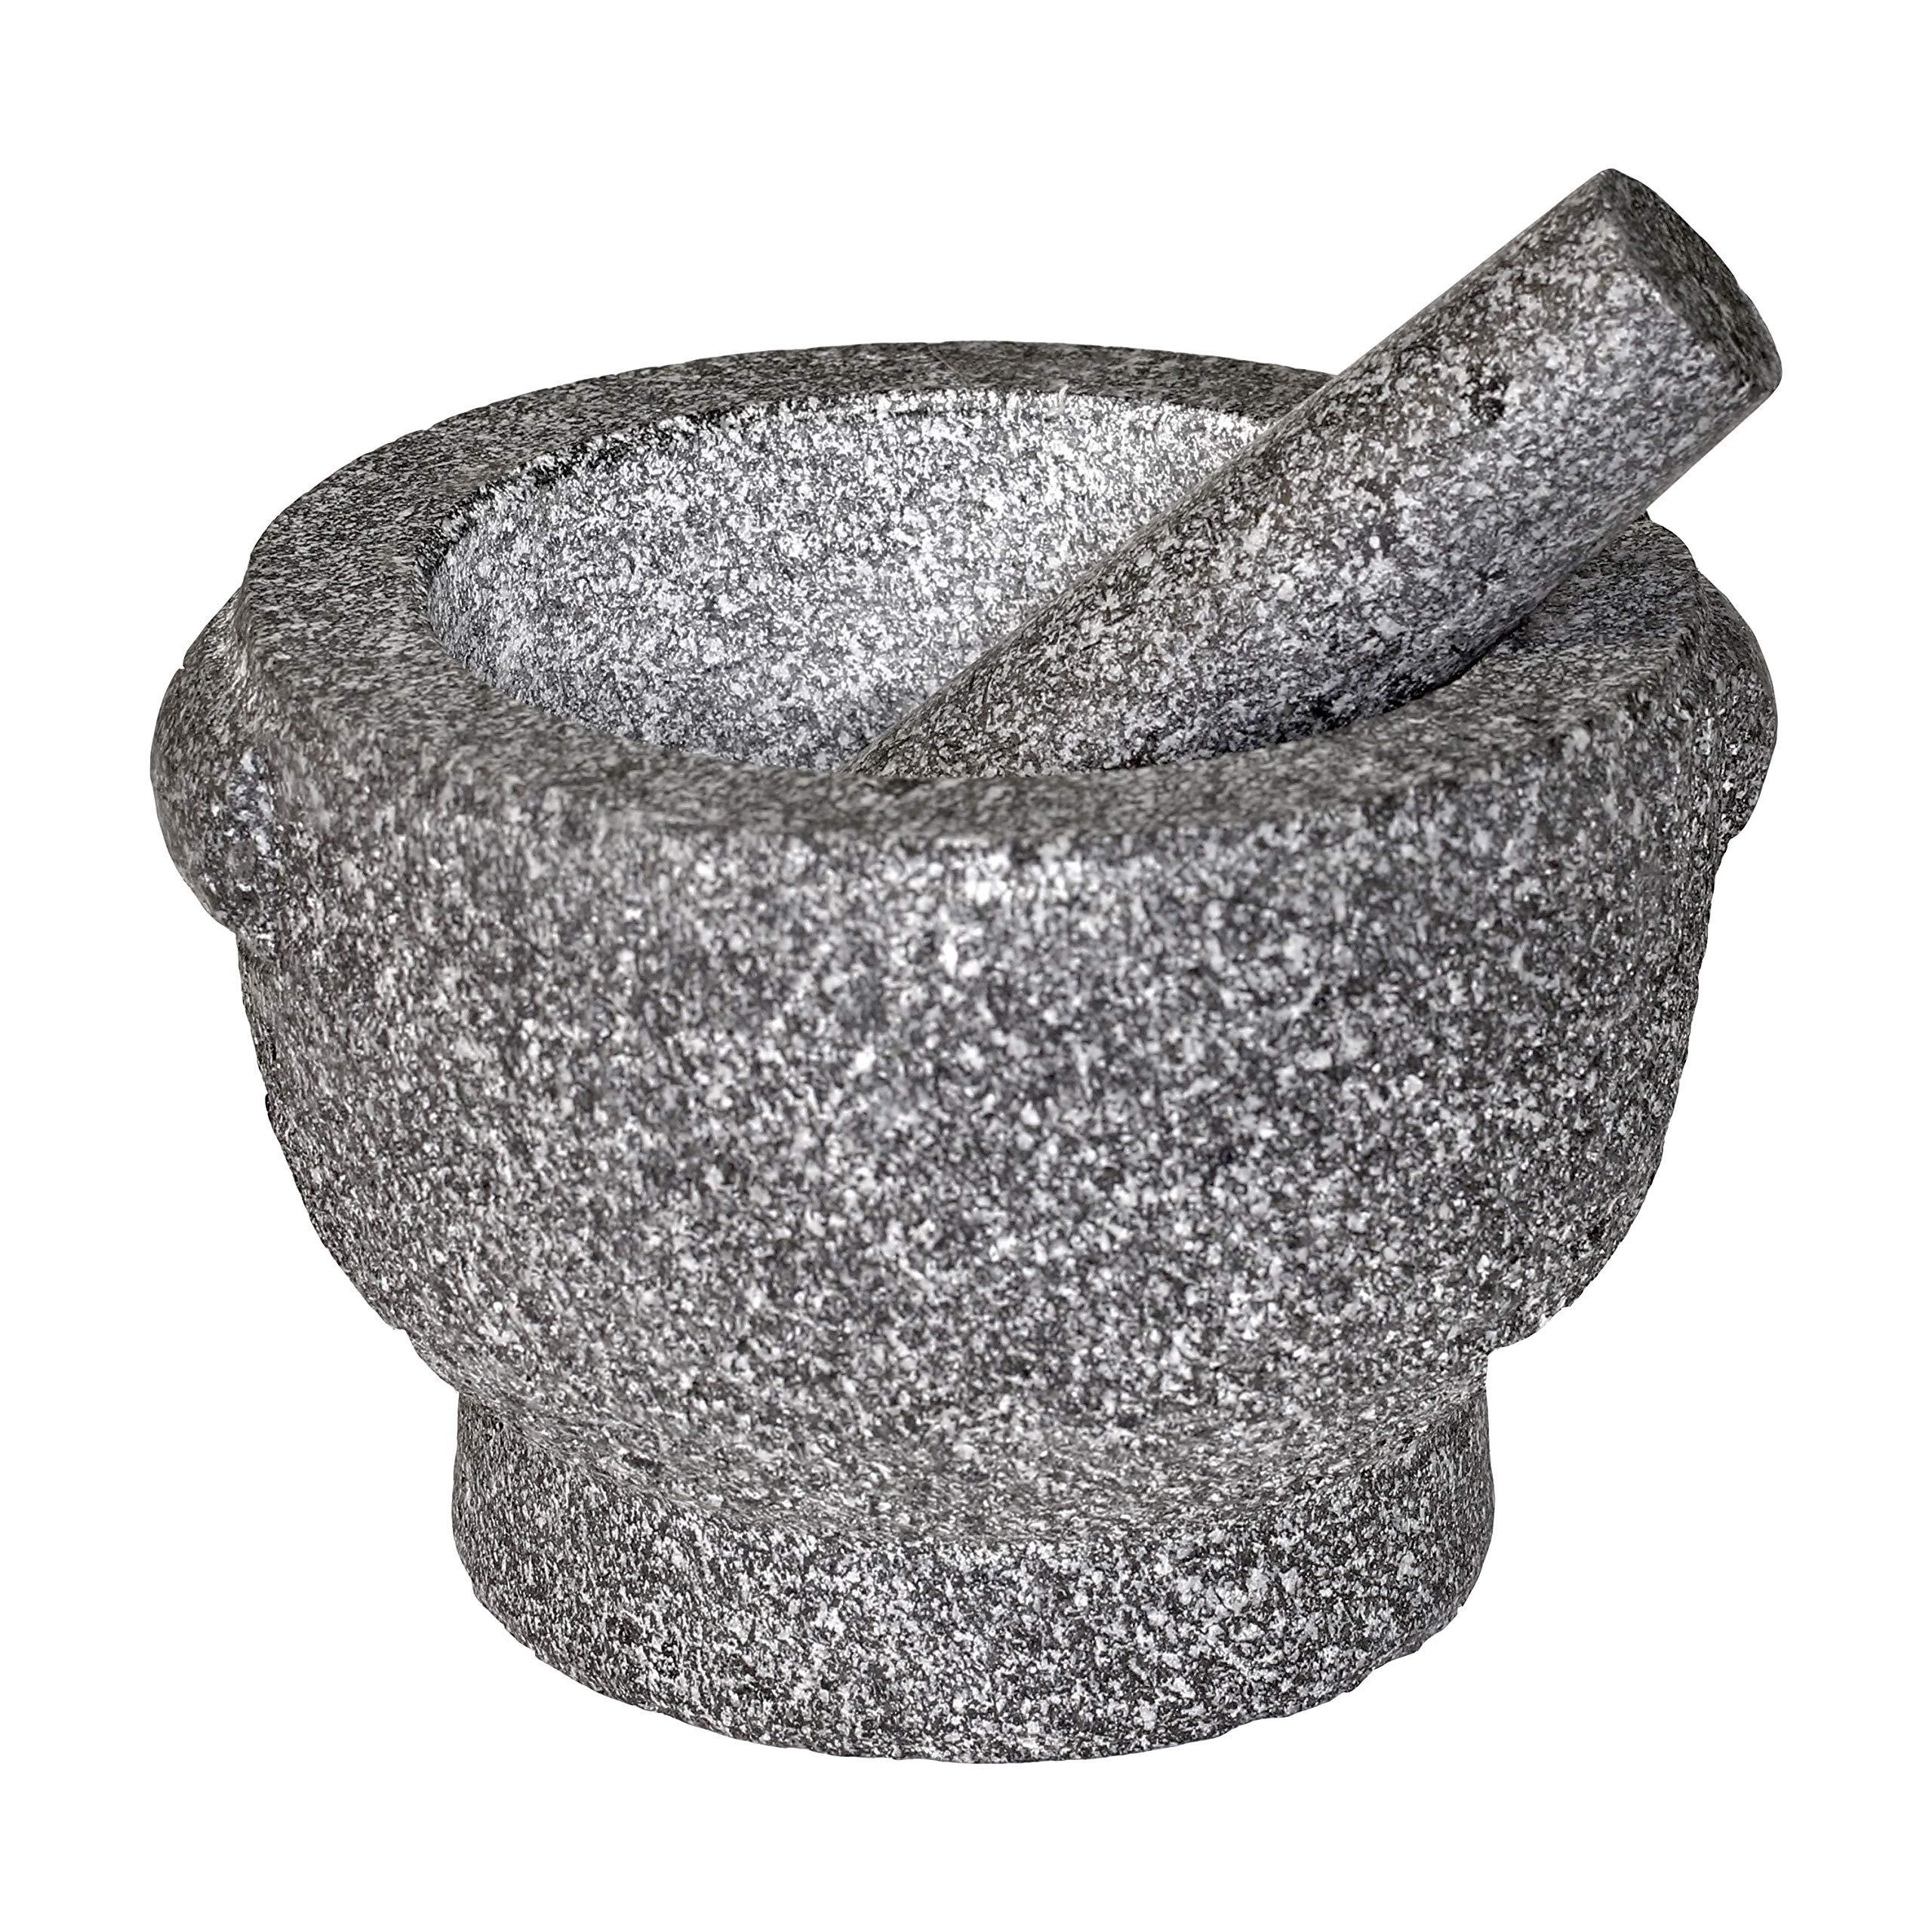 Frieling/Cilio Goliath Granite 5-Inch Tall Mortar and Pestle by Cilio